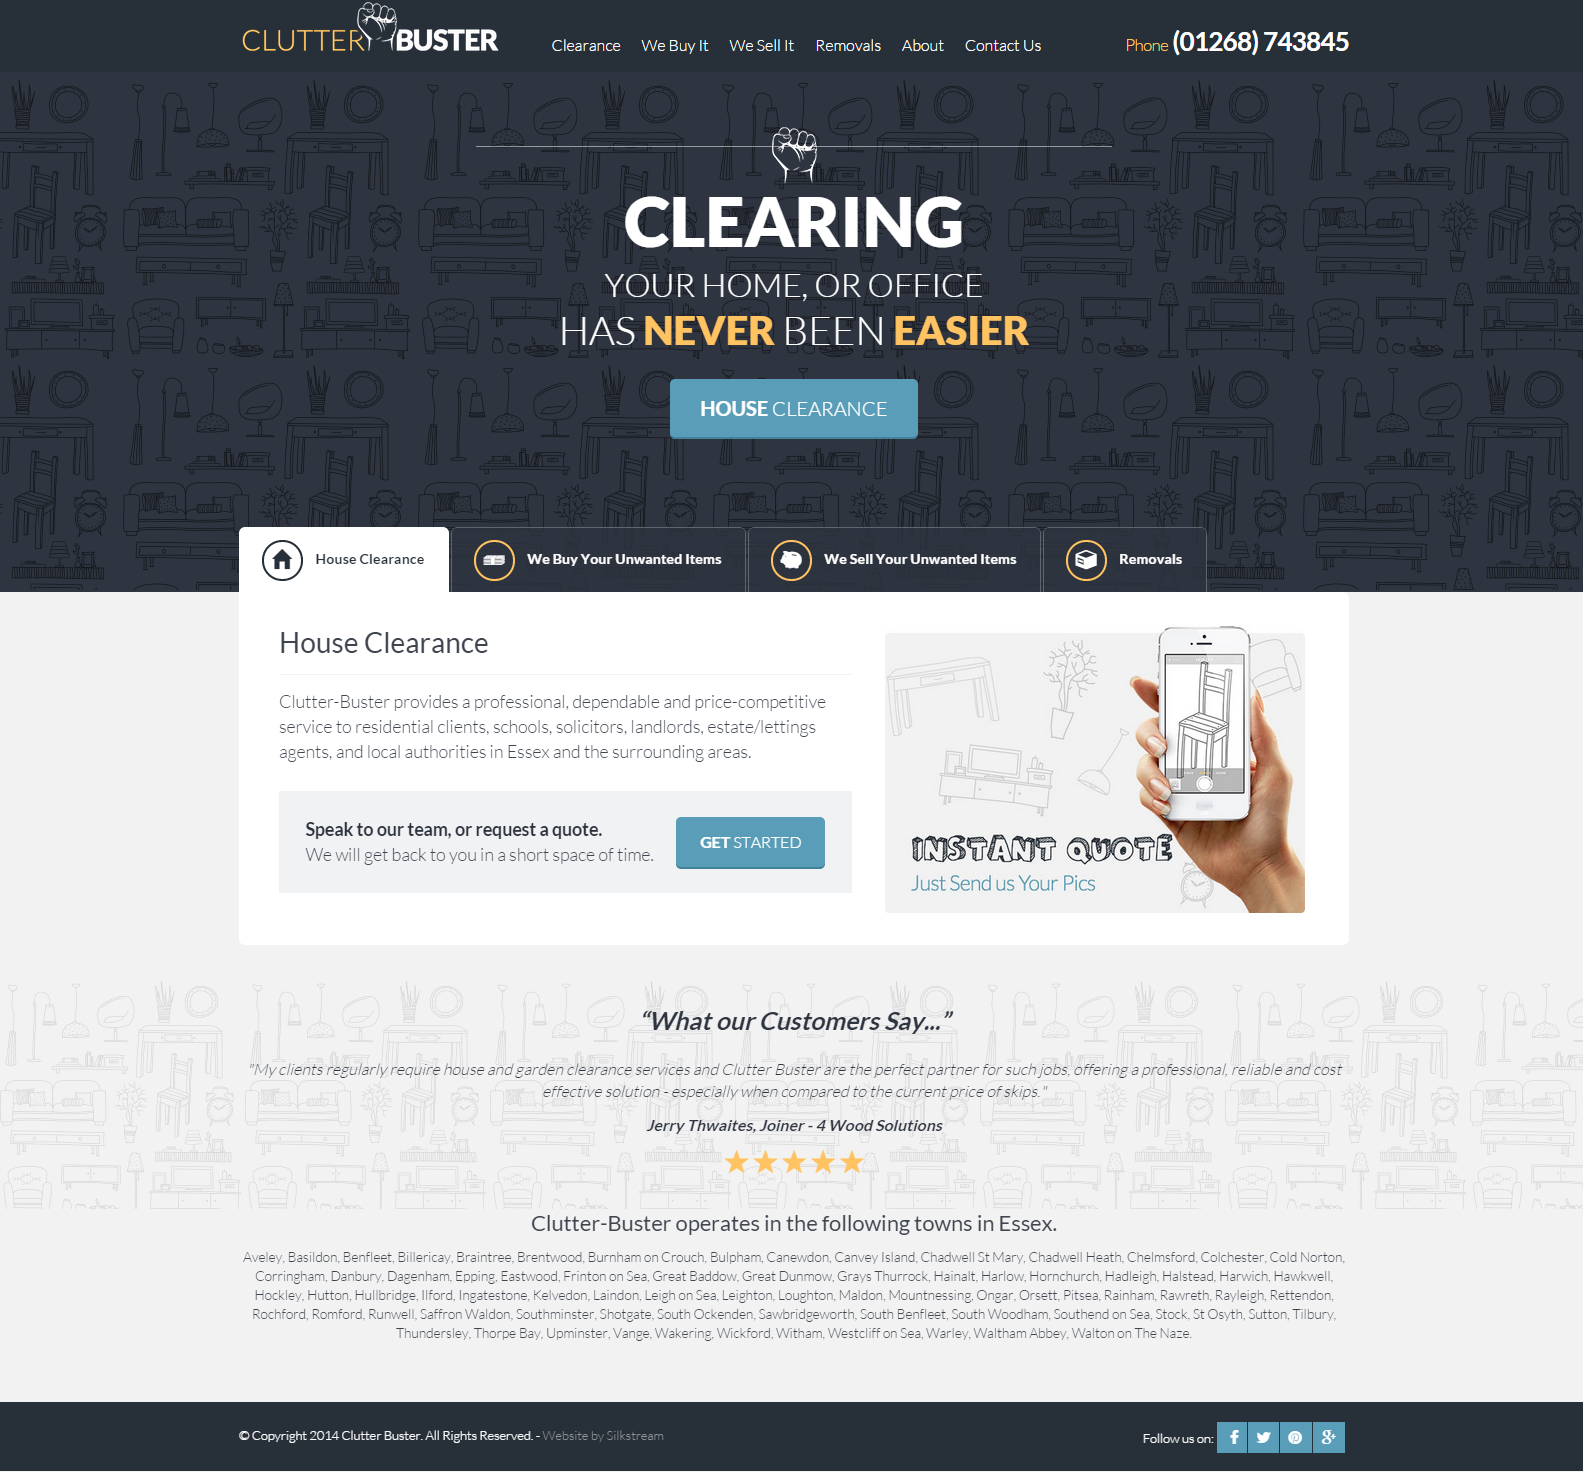 Granicus New Website Design: Clutter Buster's Clean New Website